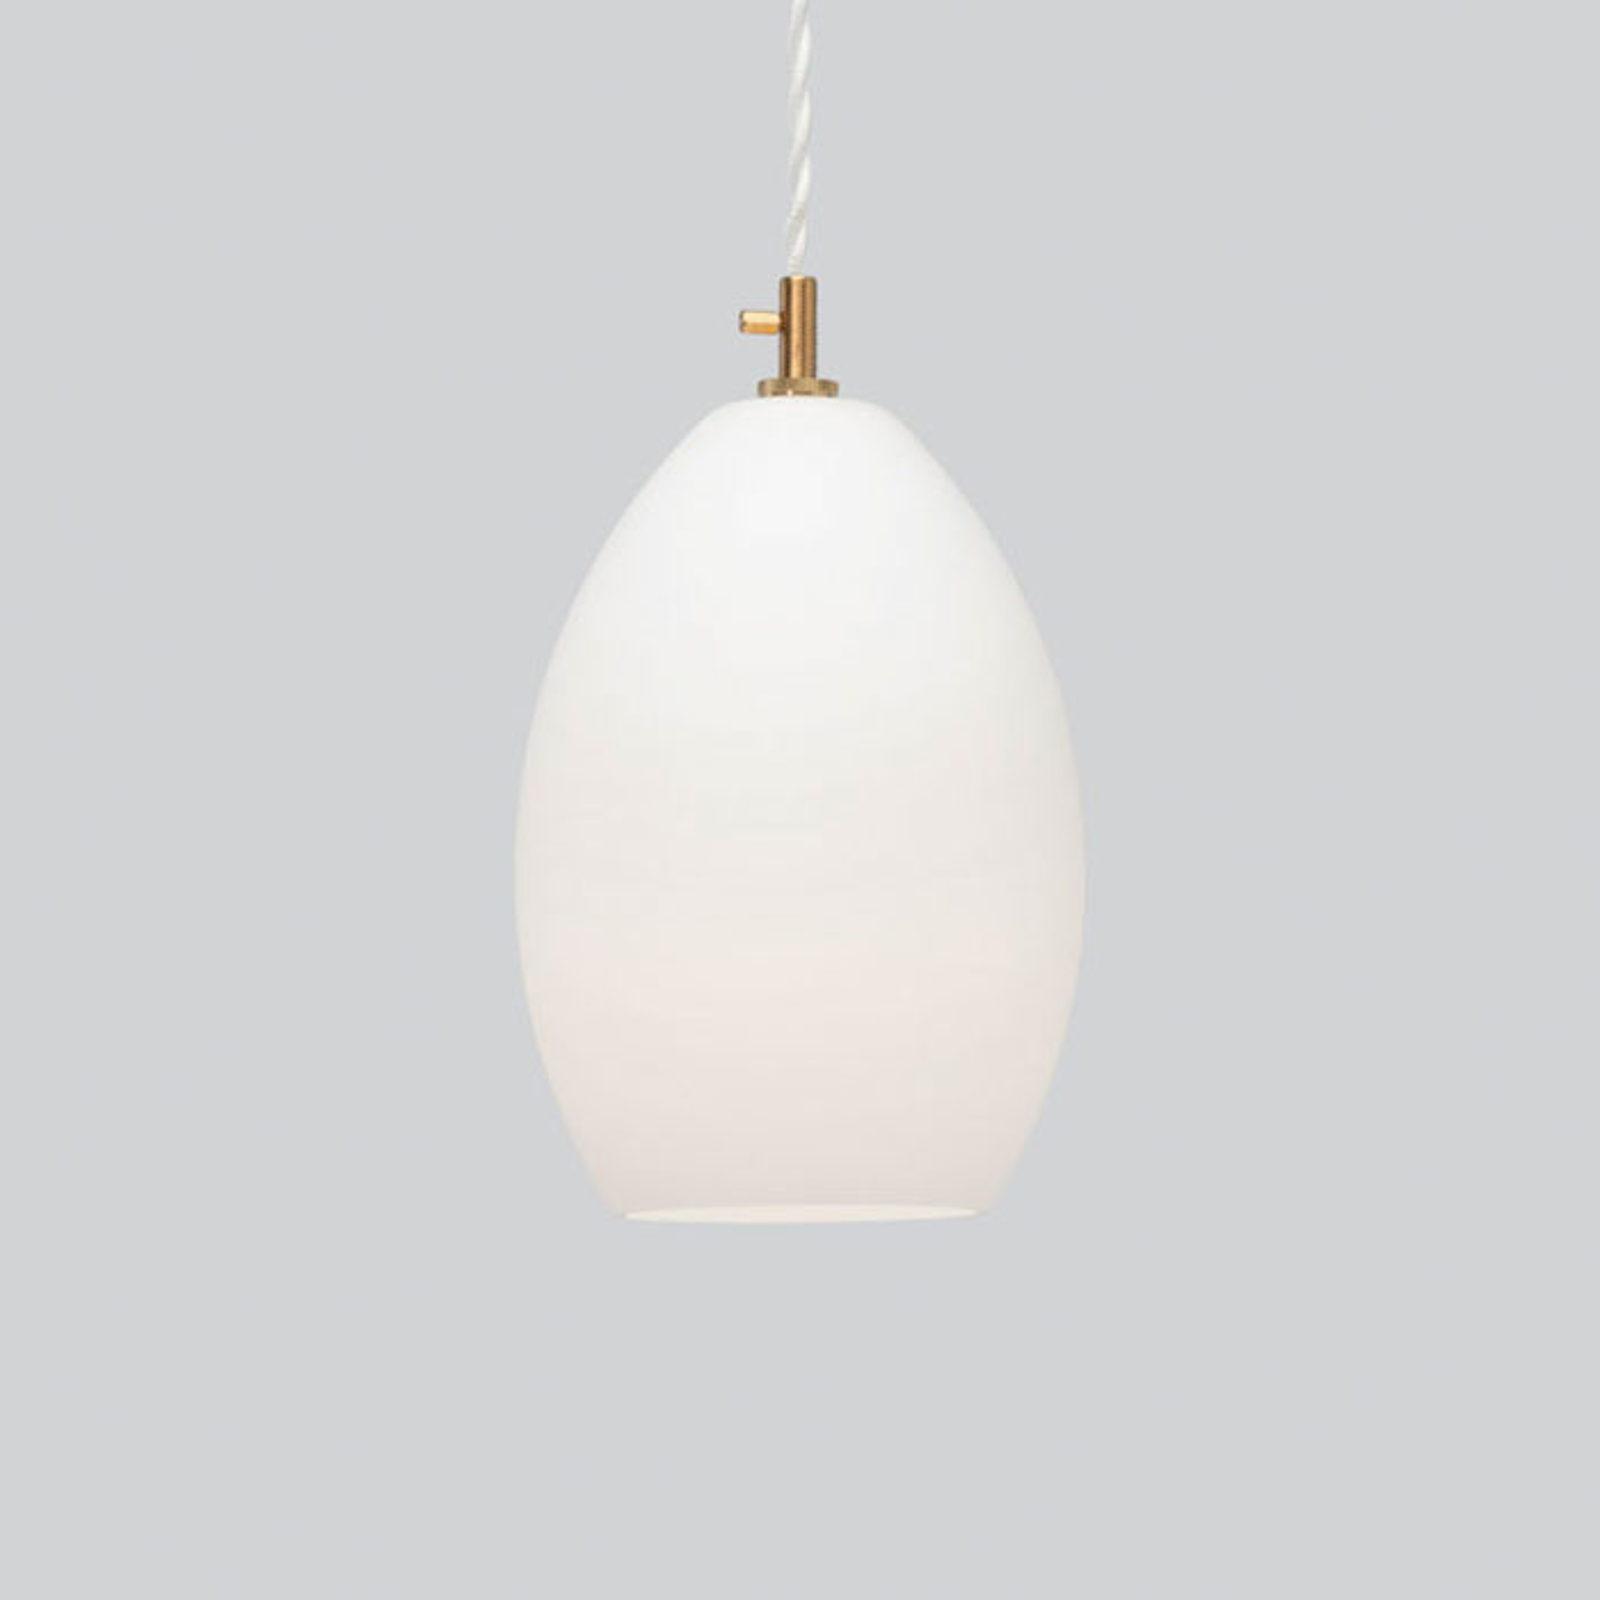 Northern Unika szklana lampa wisząca biała, large